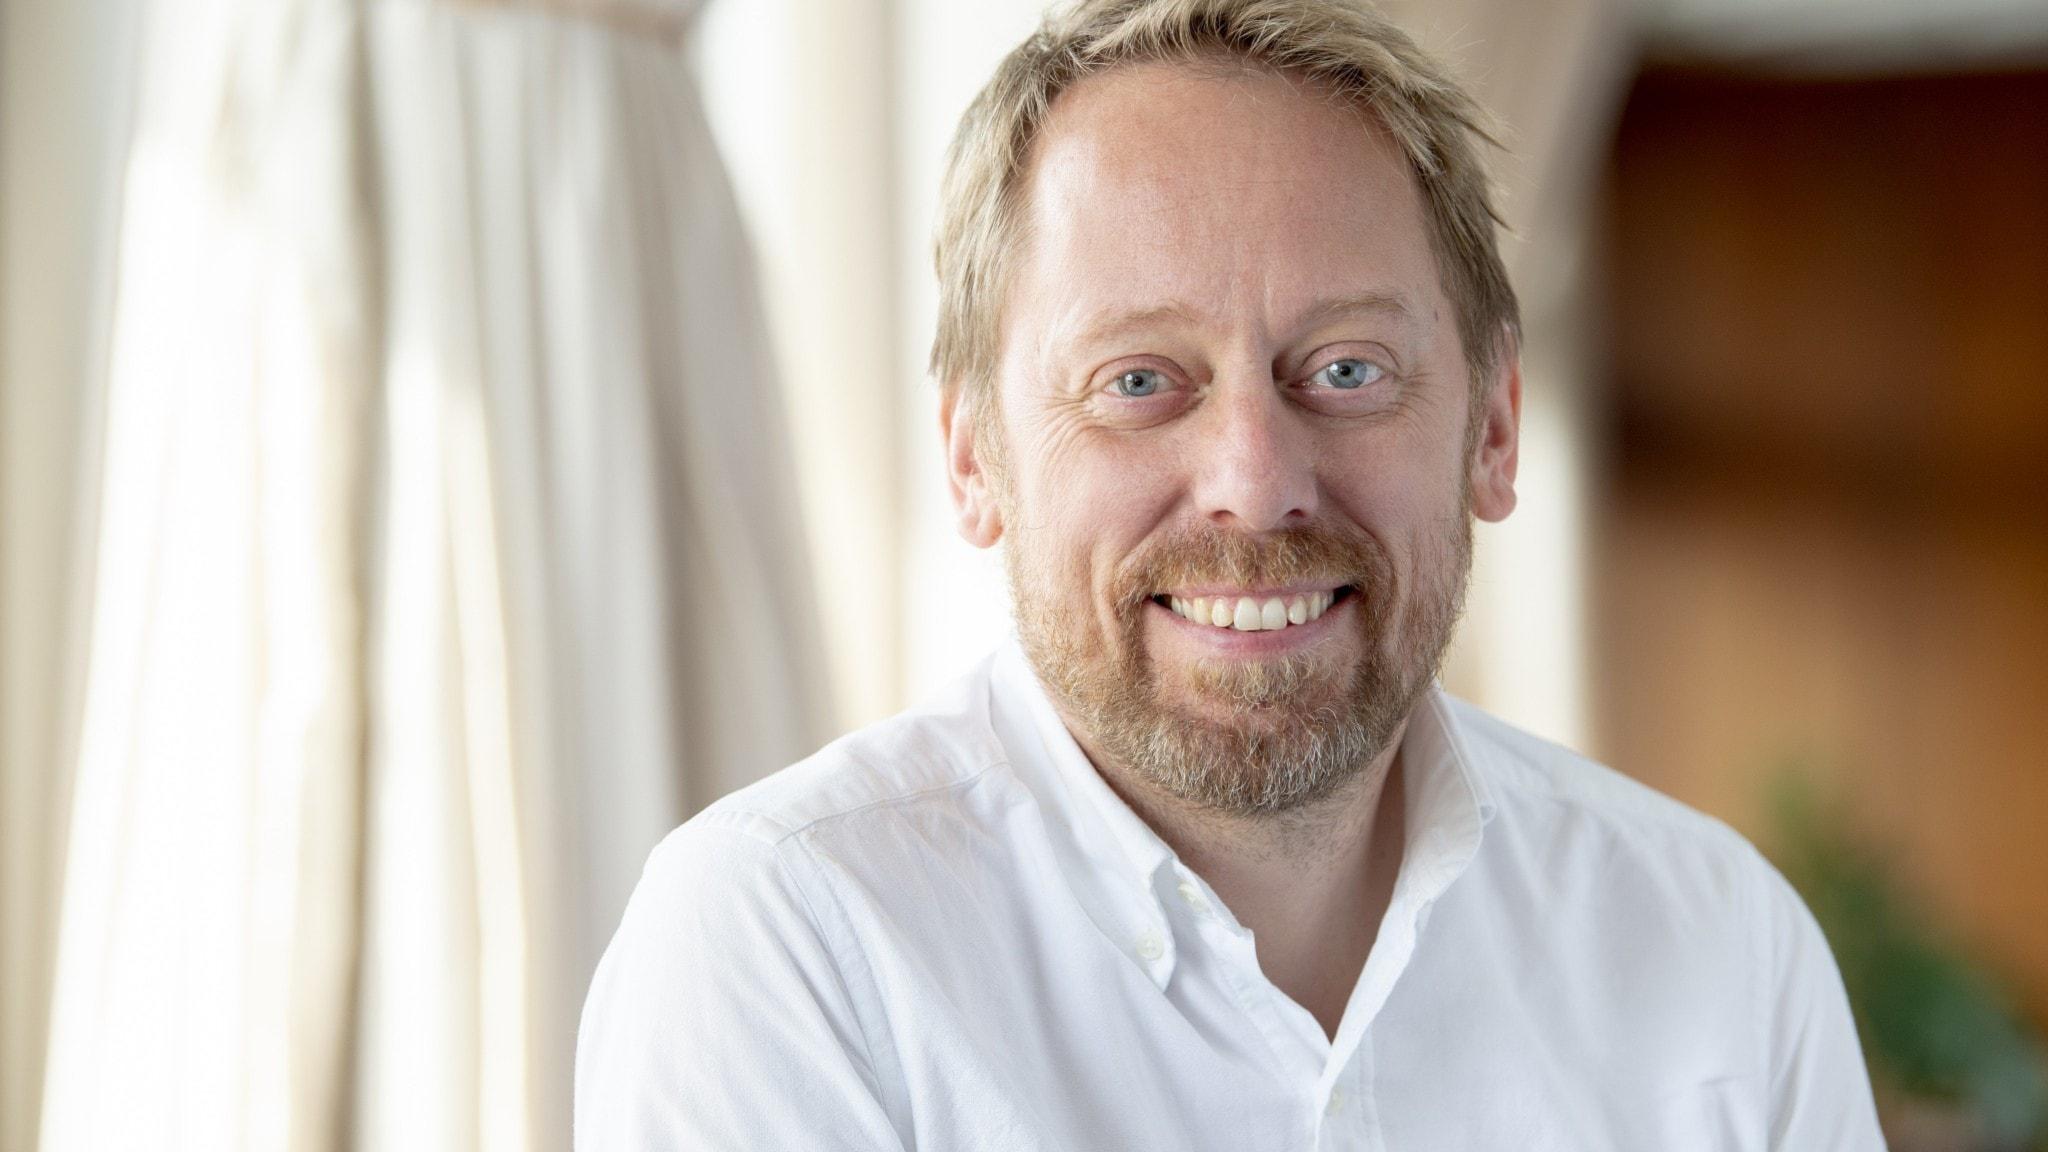 Programledaren Peter Settman klädd i vit skjorta.